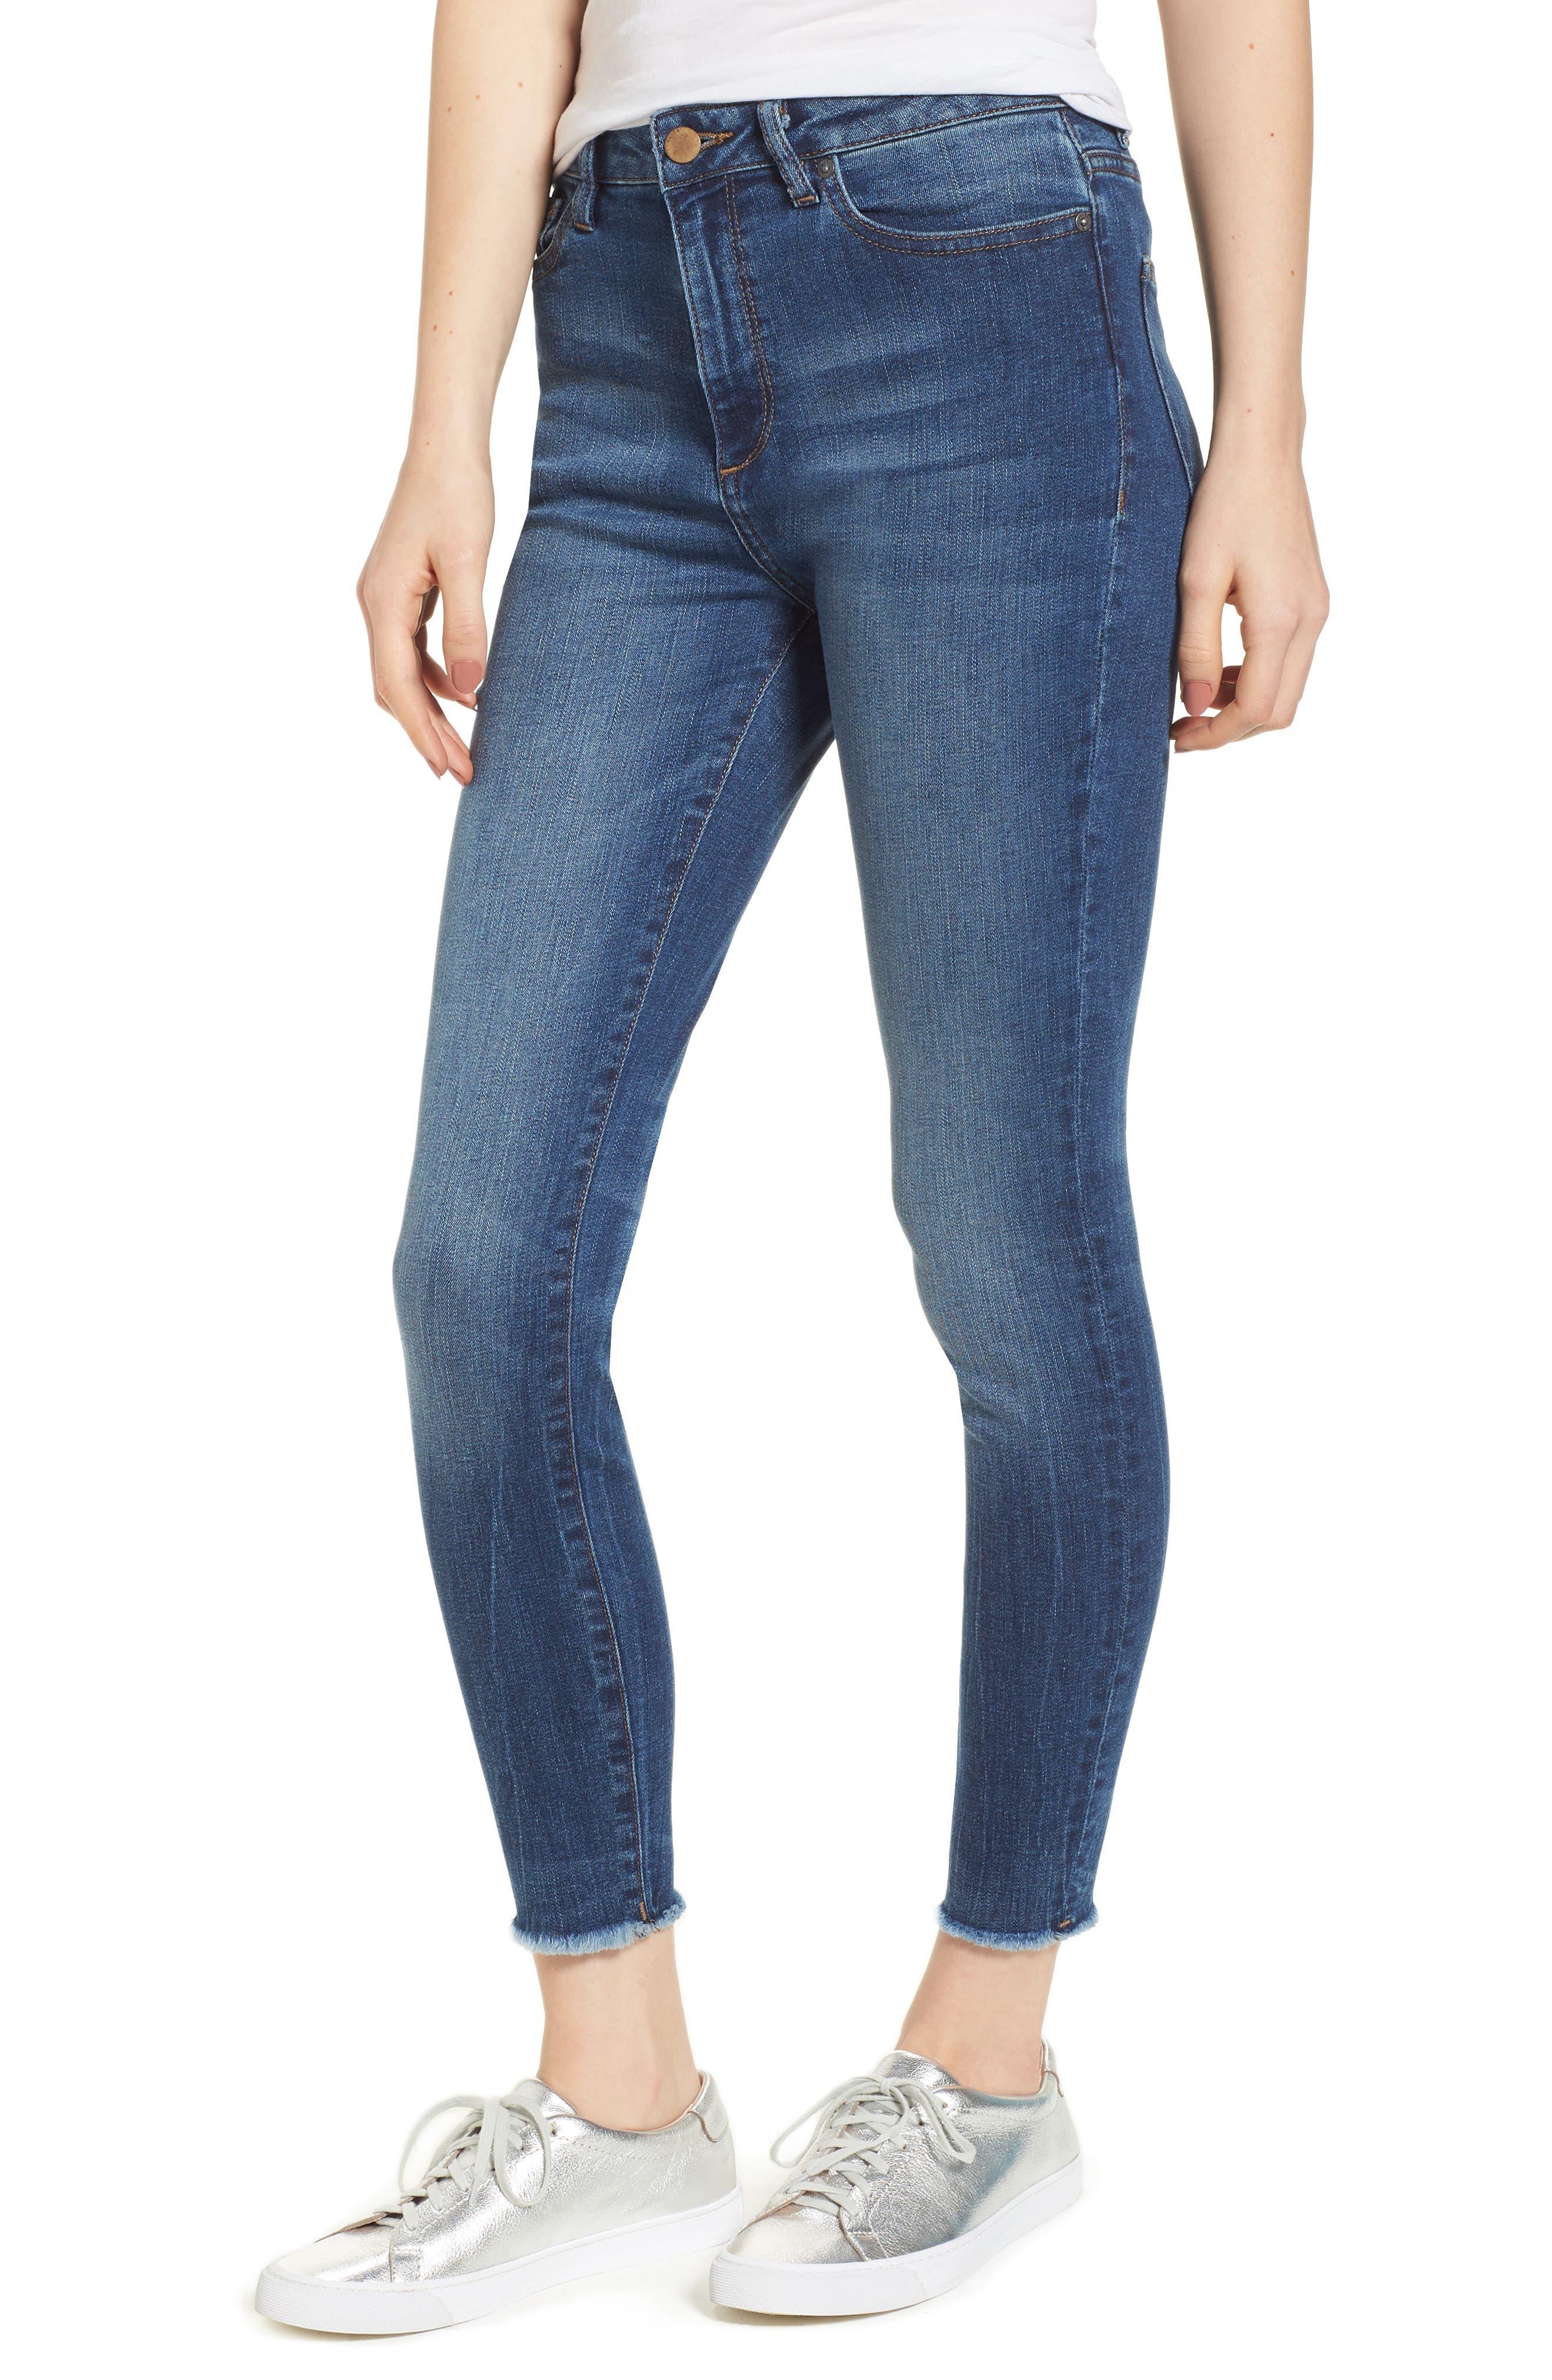 Chrissy Trimtone High Waist Skinny Jeans,                         Main,                         color, Bal Harbour